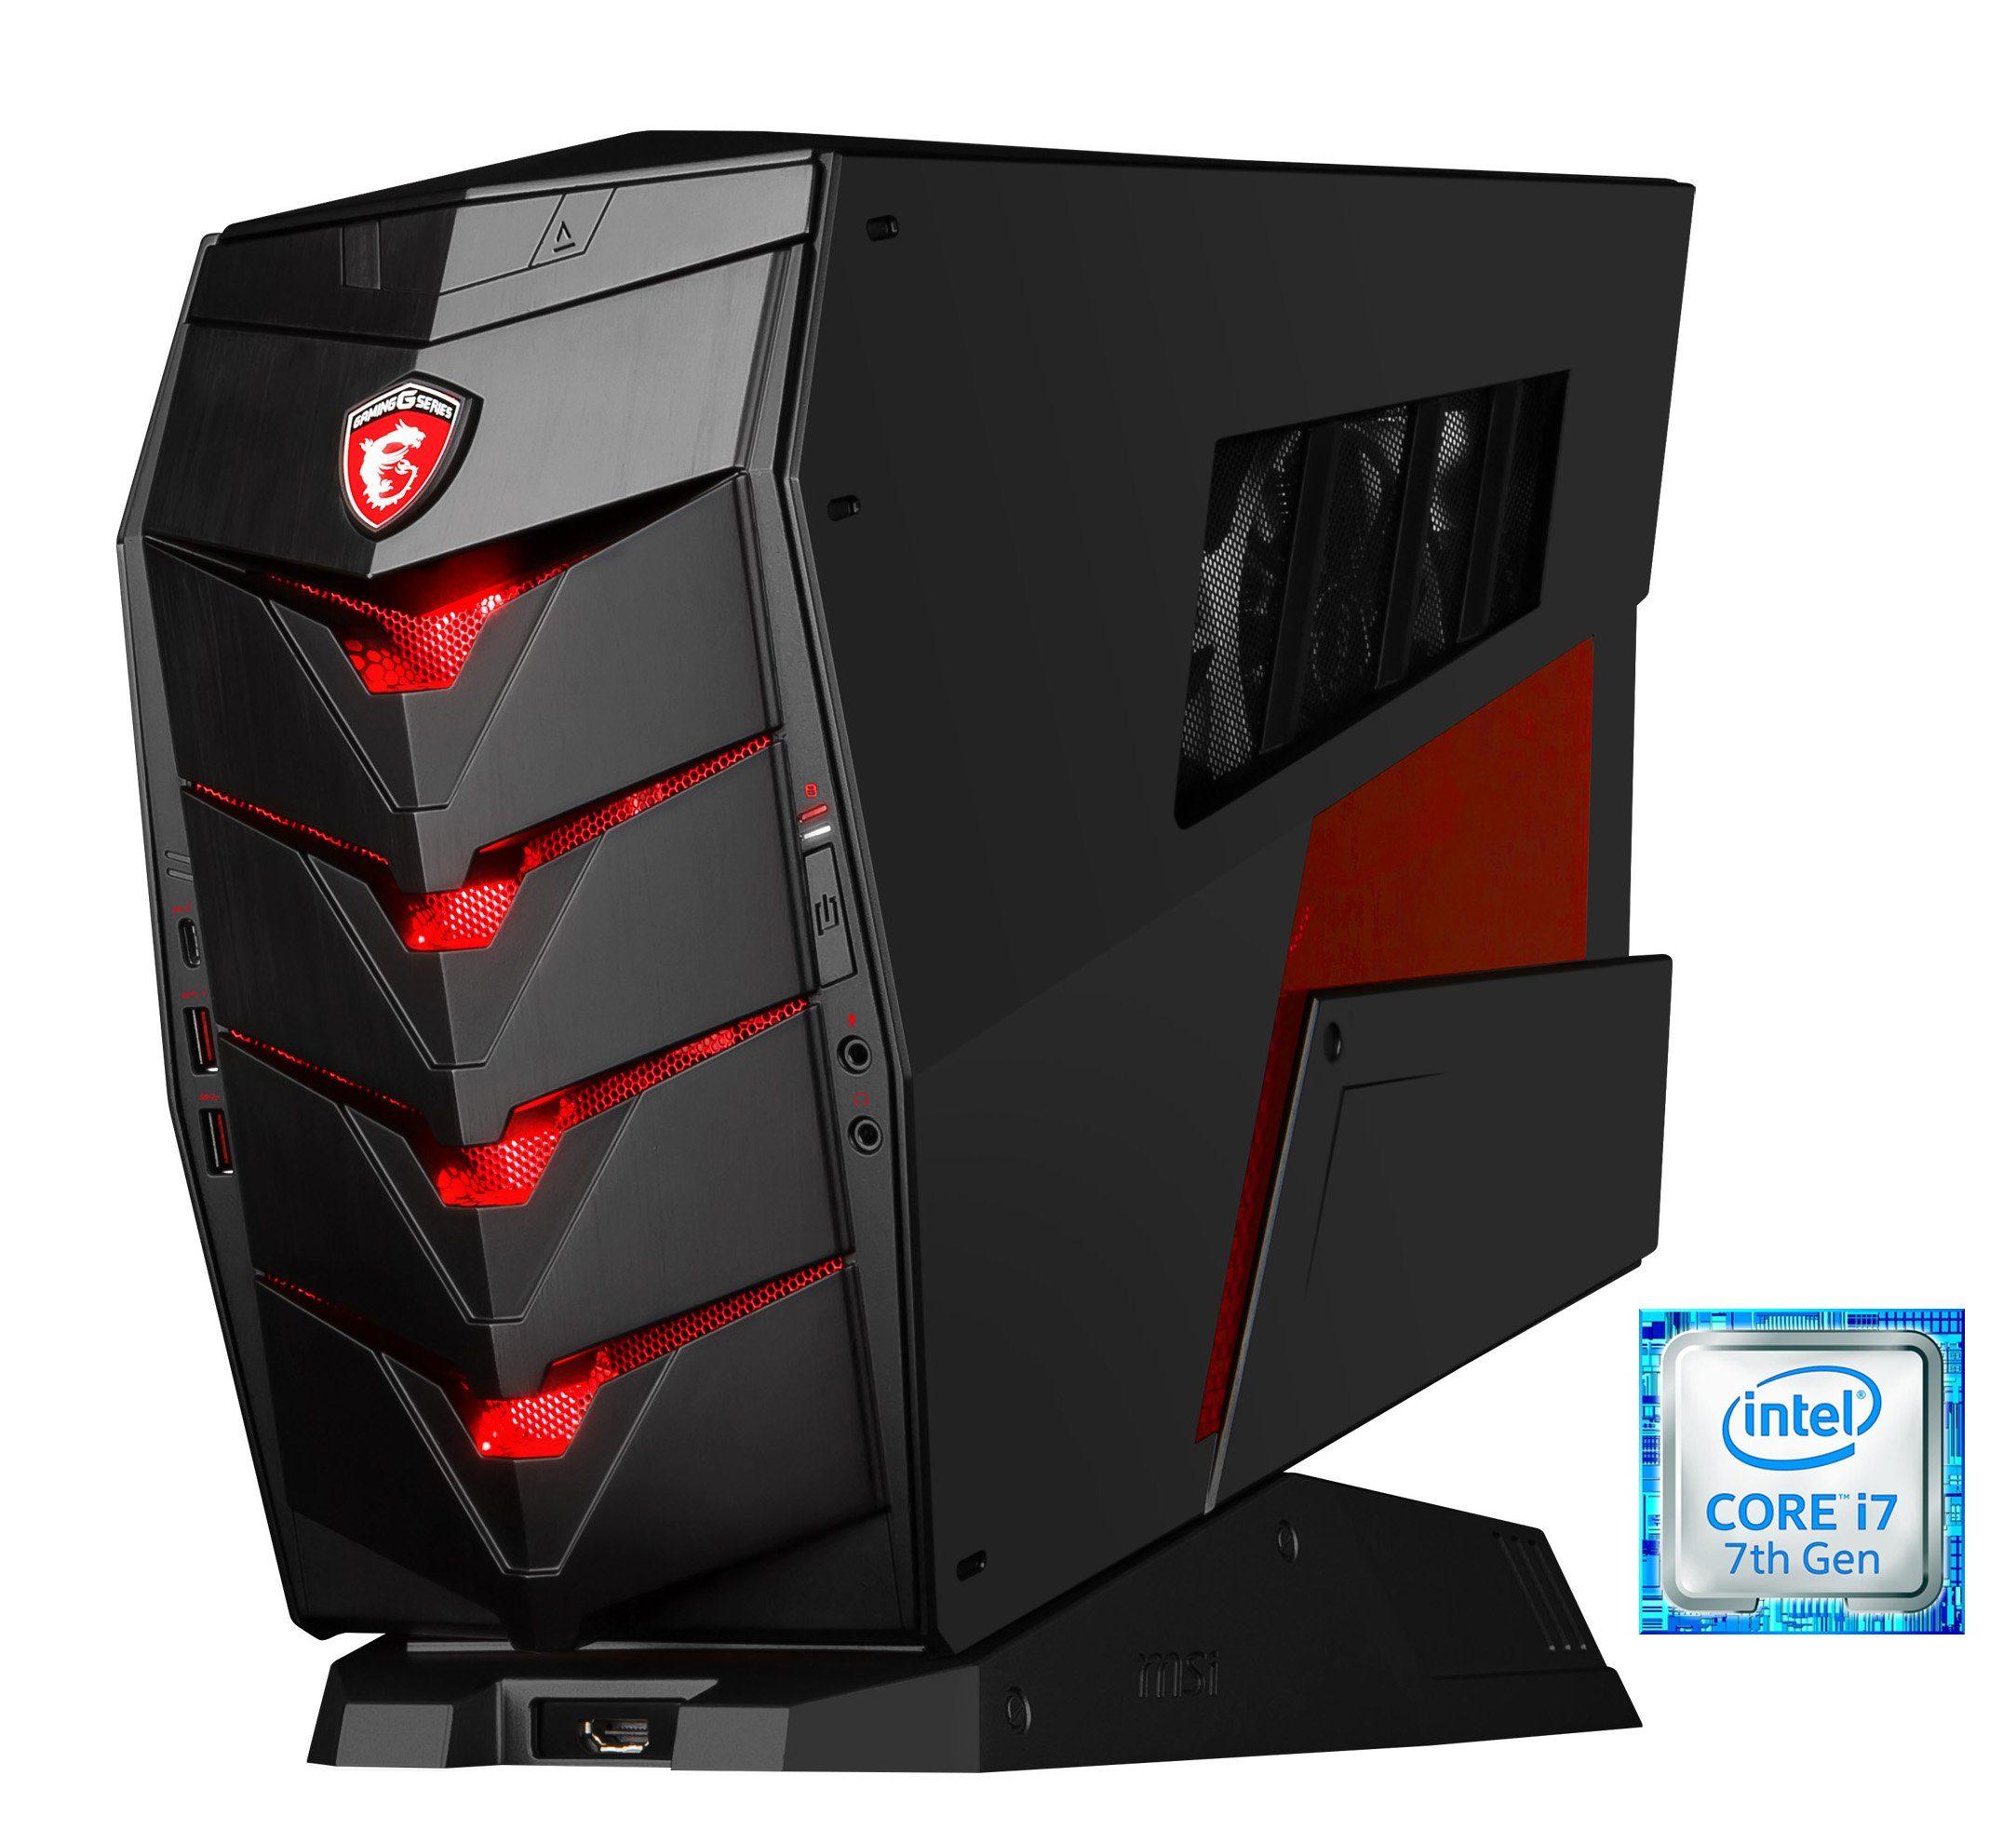 MSI Gaming PC, Intel® i7-7700, 16GB, SSD + HDD, GeForce® GTX 1070 »Aegis 3 VR7RD-019DE«